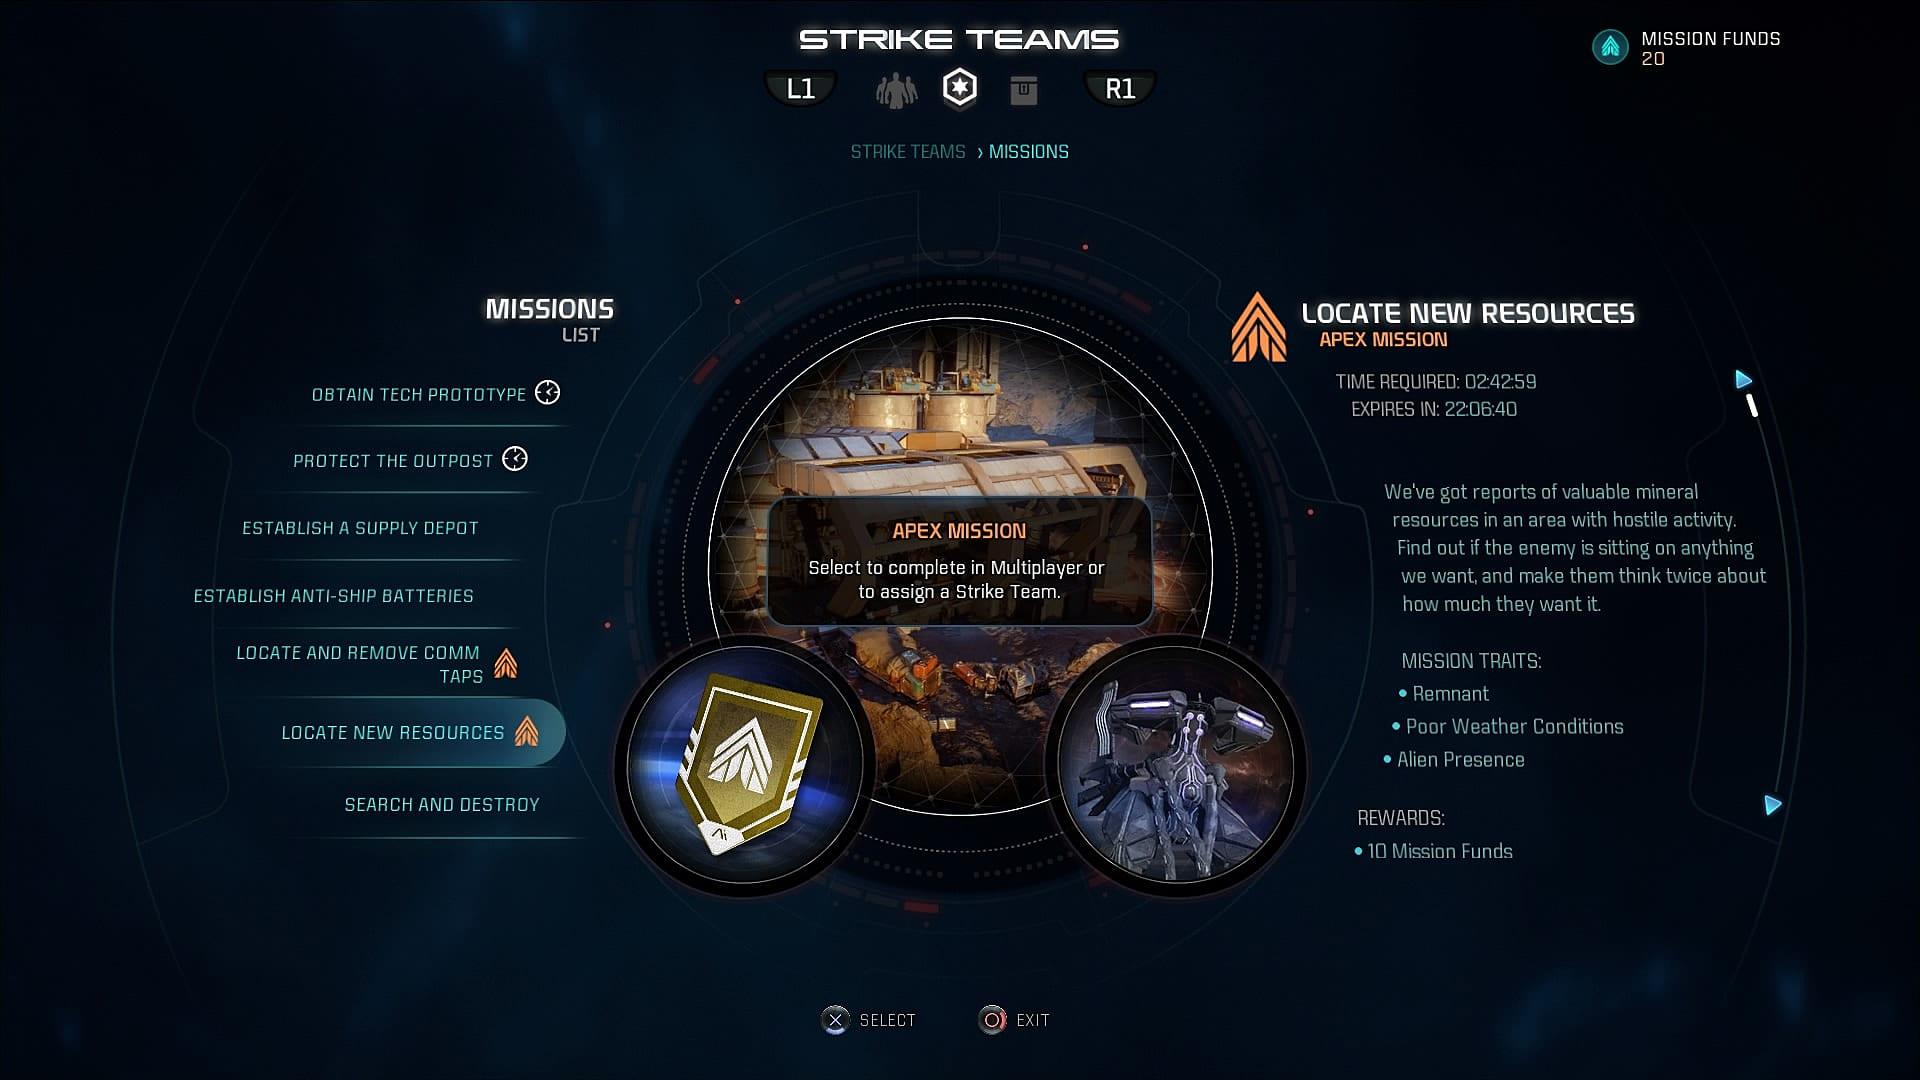 Mass Effect: Andromeda, strike teams